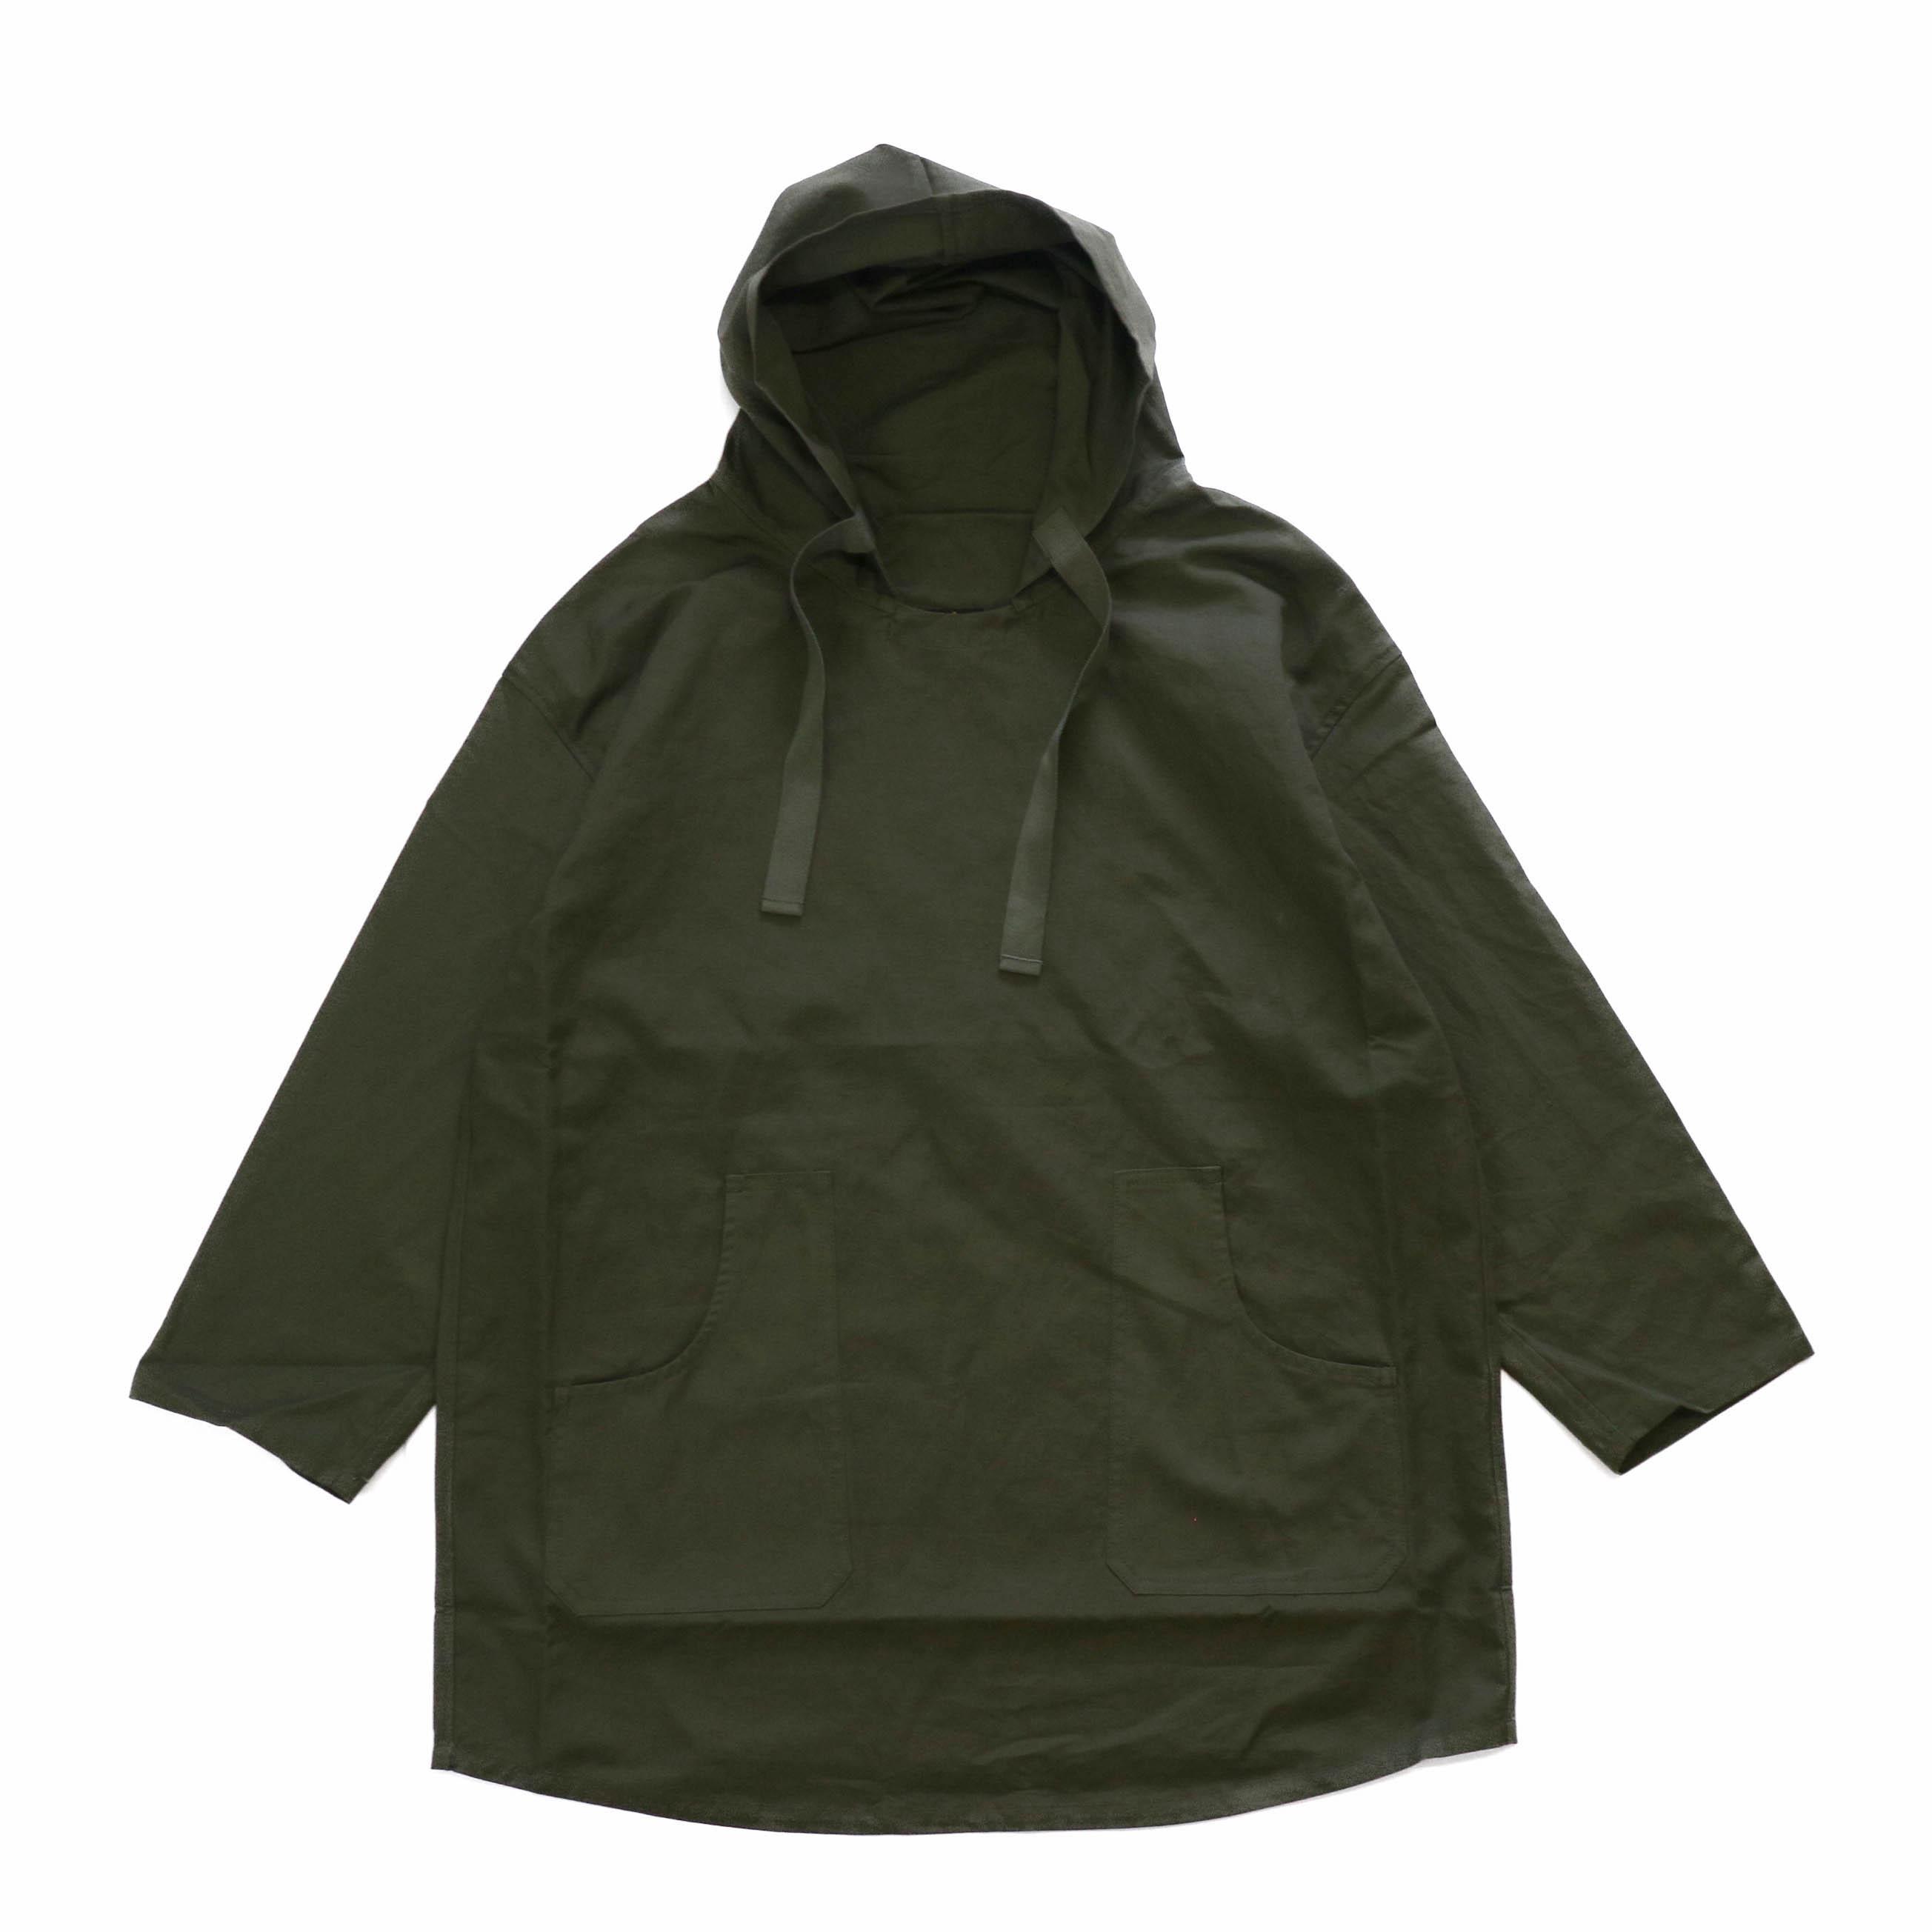 Needles / Pullover Parka -C/L Canvas -Green